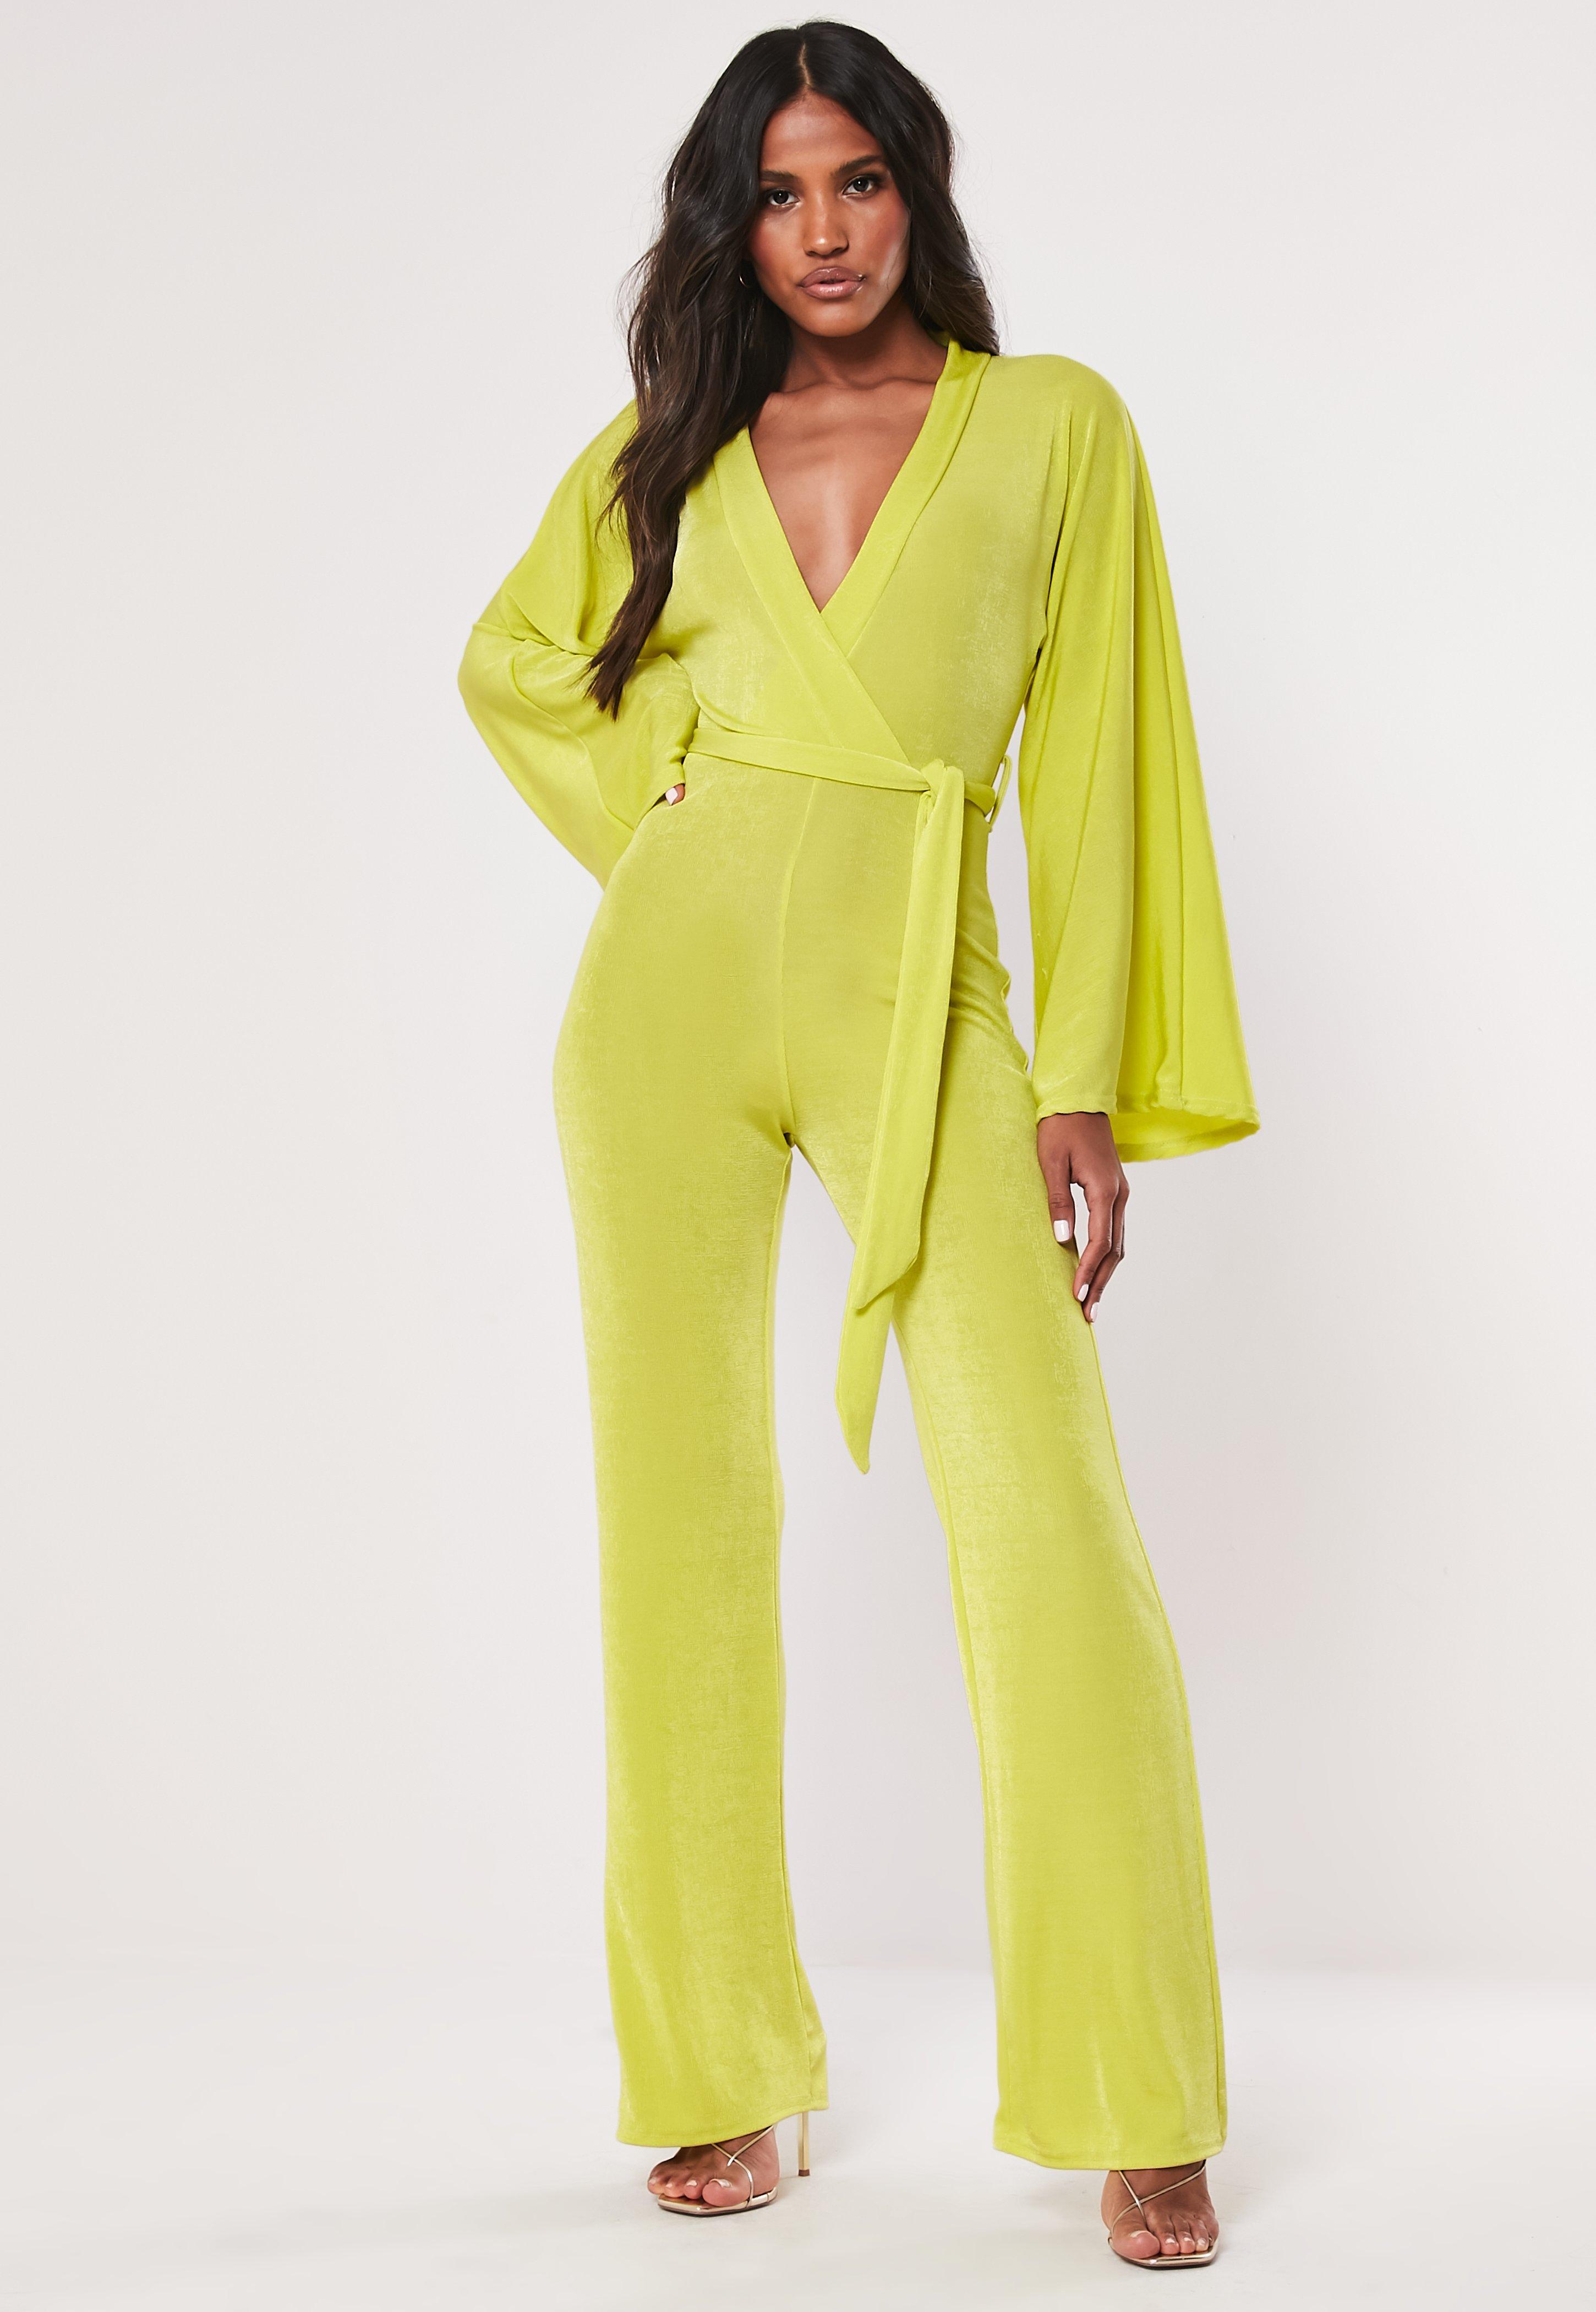 7ab35f0ffef Dressy Jumpsuits - Evening Jumpsuits